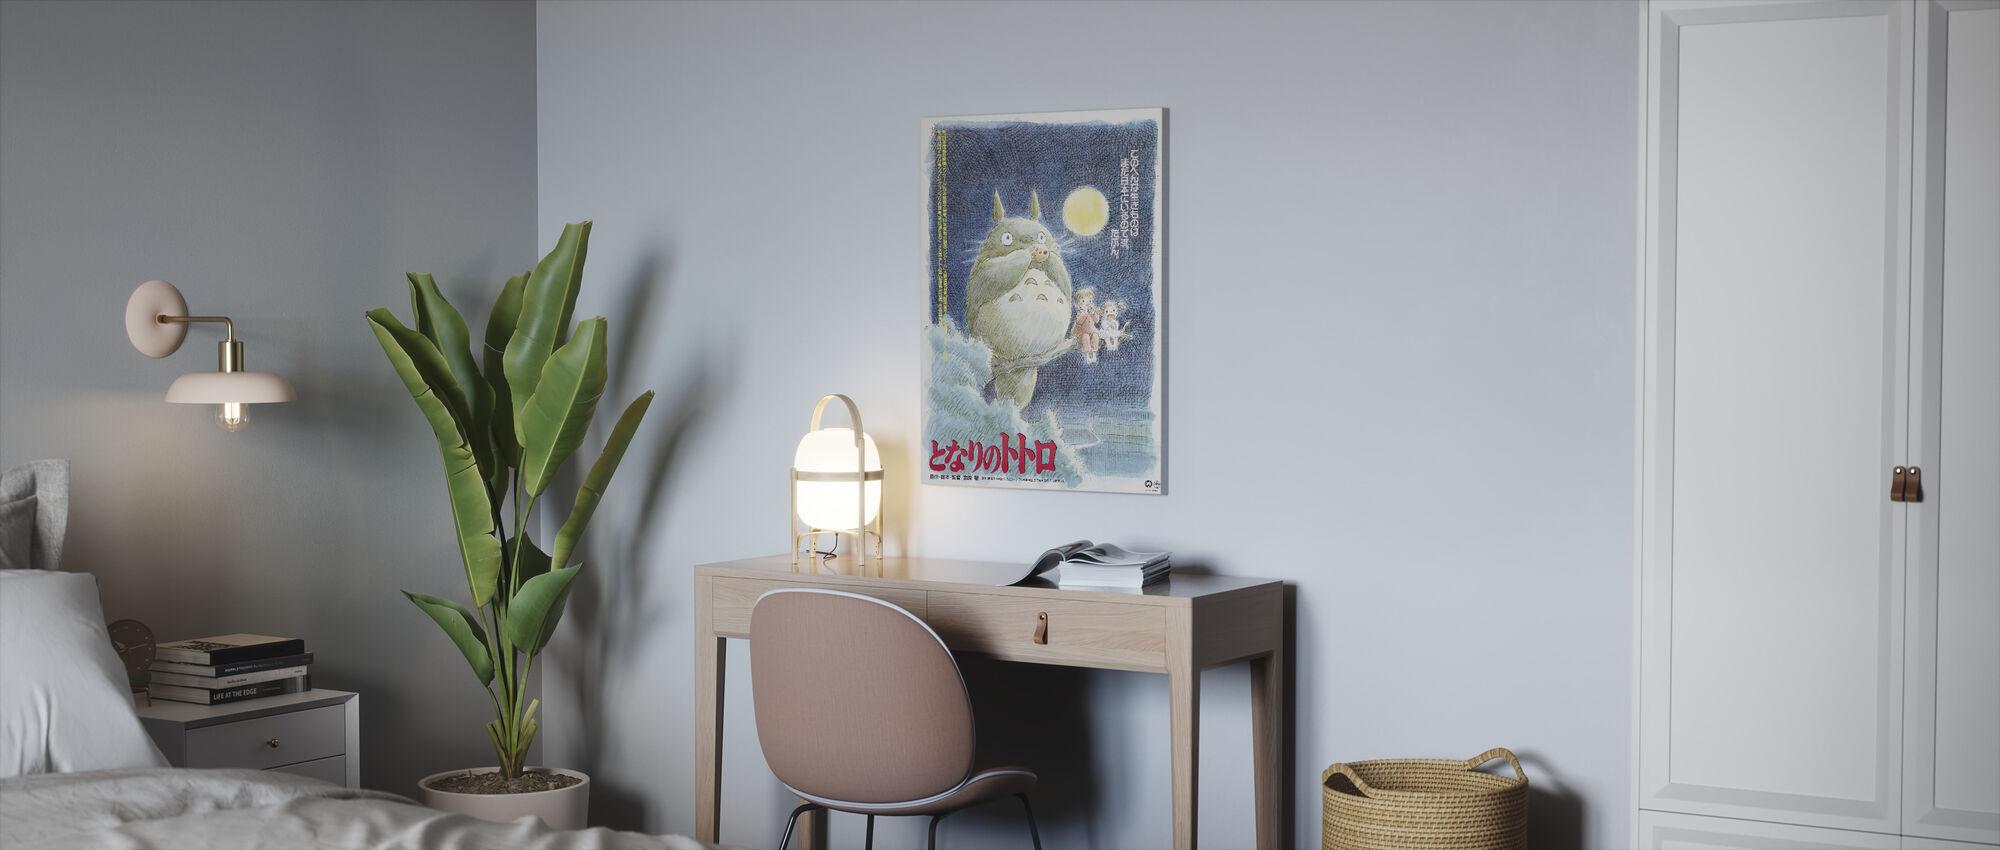 My Neighbor Totoro - Canvas print - Office